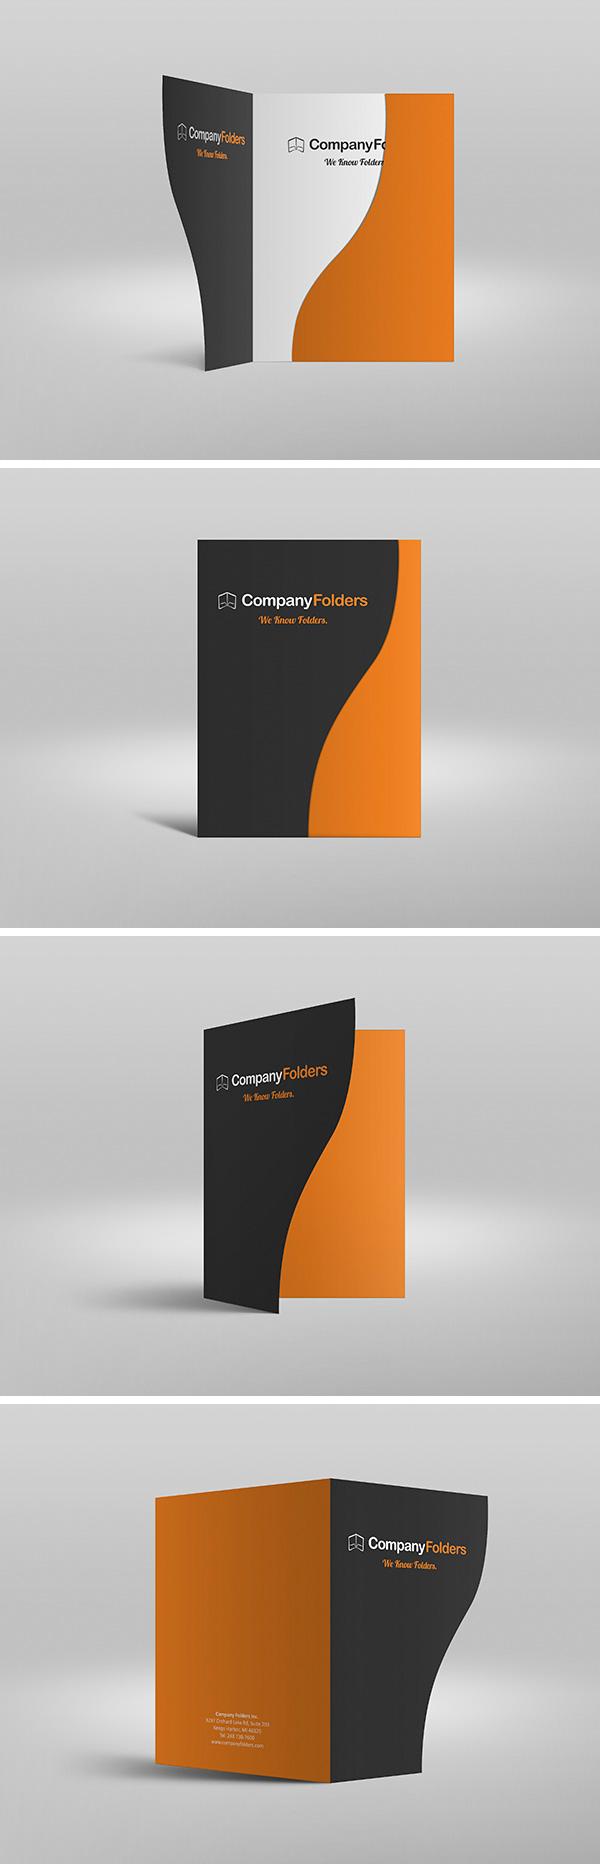 Serpentine Presentation Folder MockUp